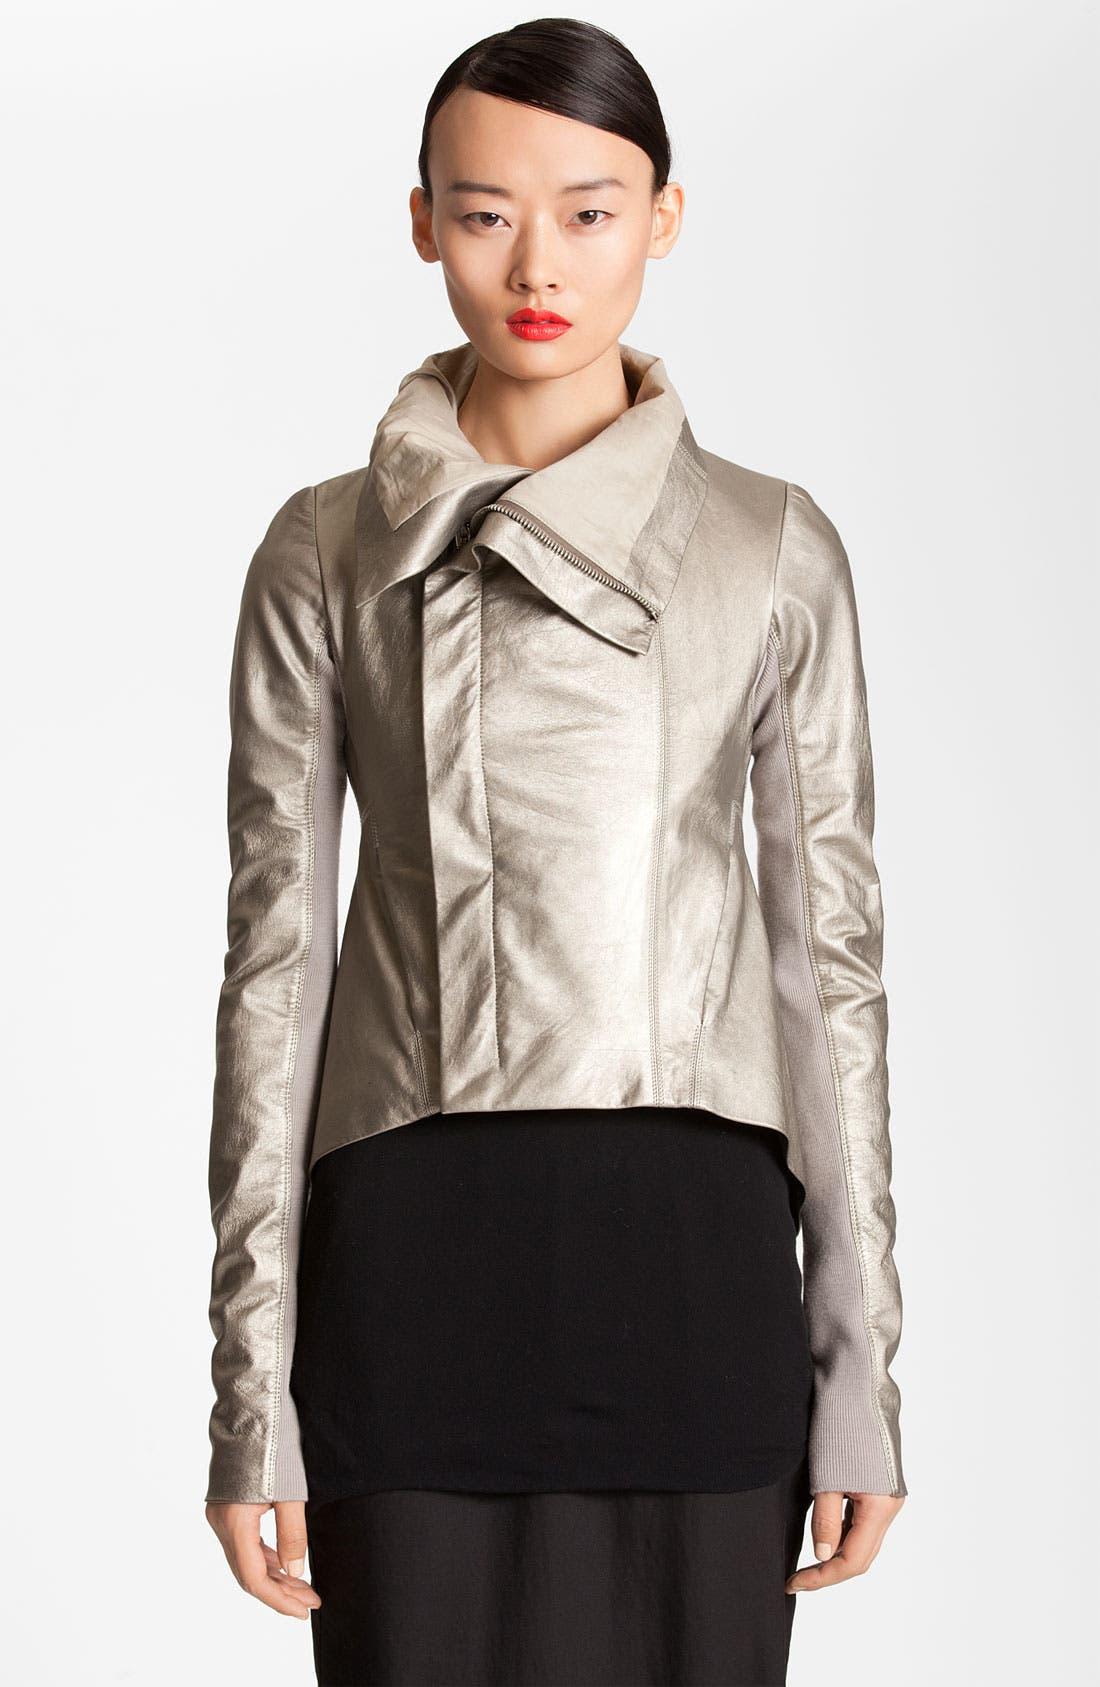 Alternate Image 1 Selected - Rick Owens Metallic Leather Jacket